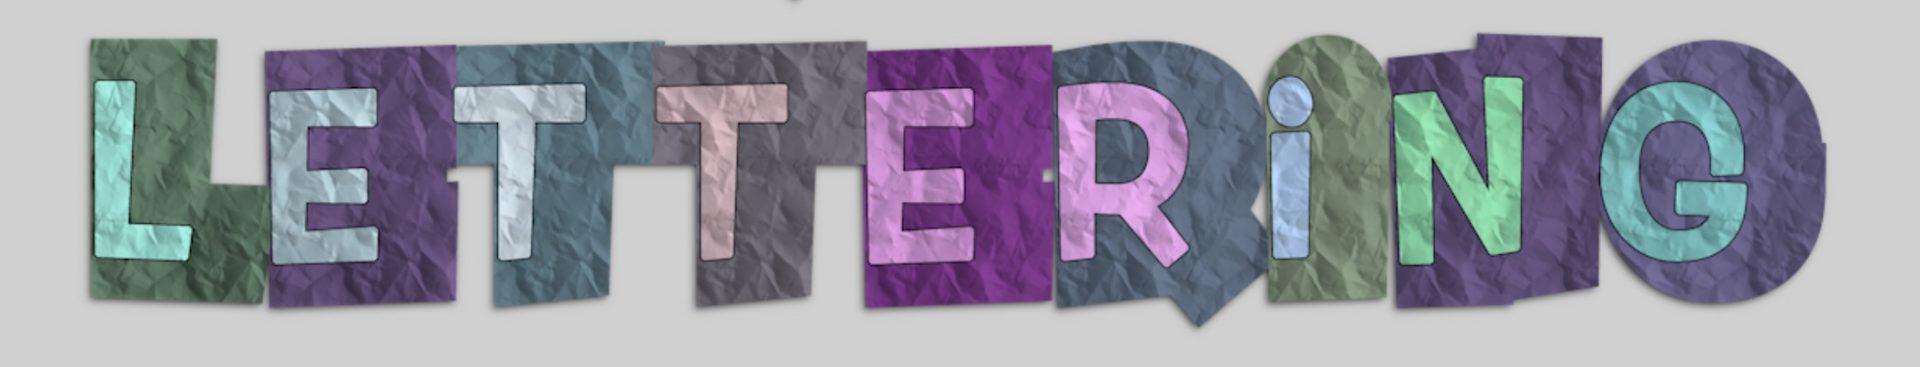 lettering offsets